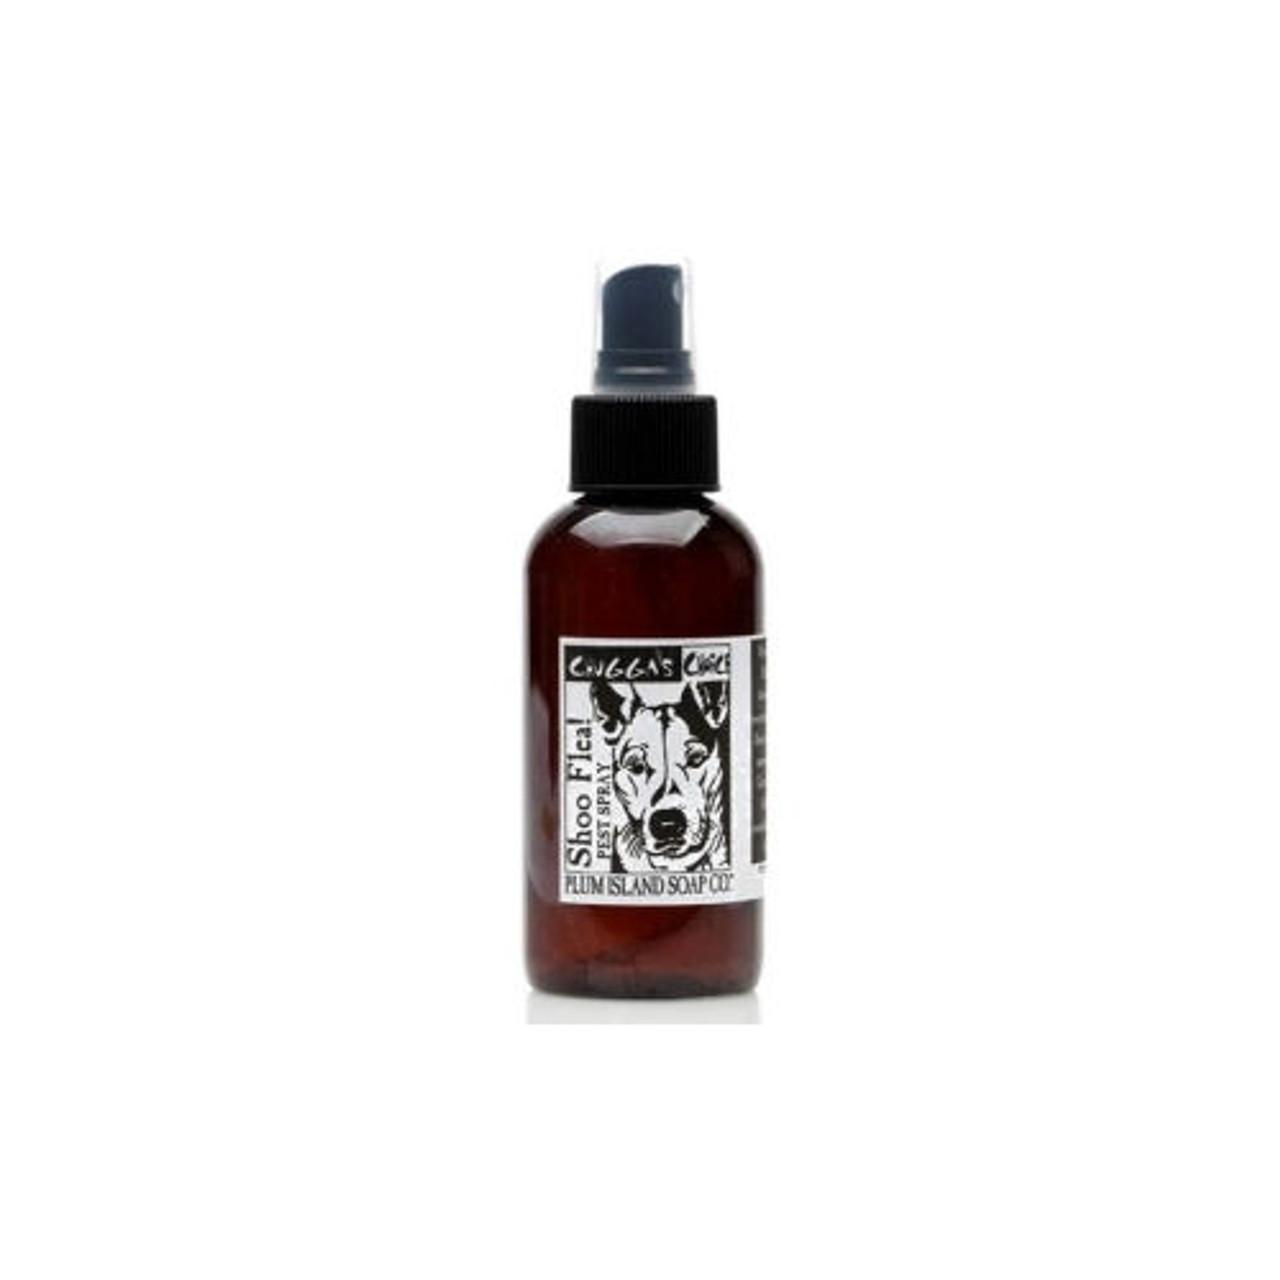 Natural Flea Spray - Plum Island